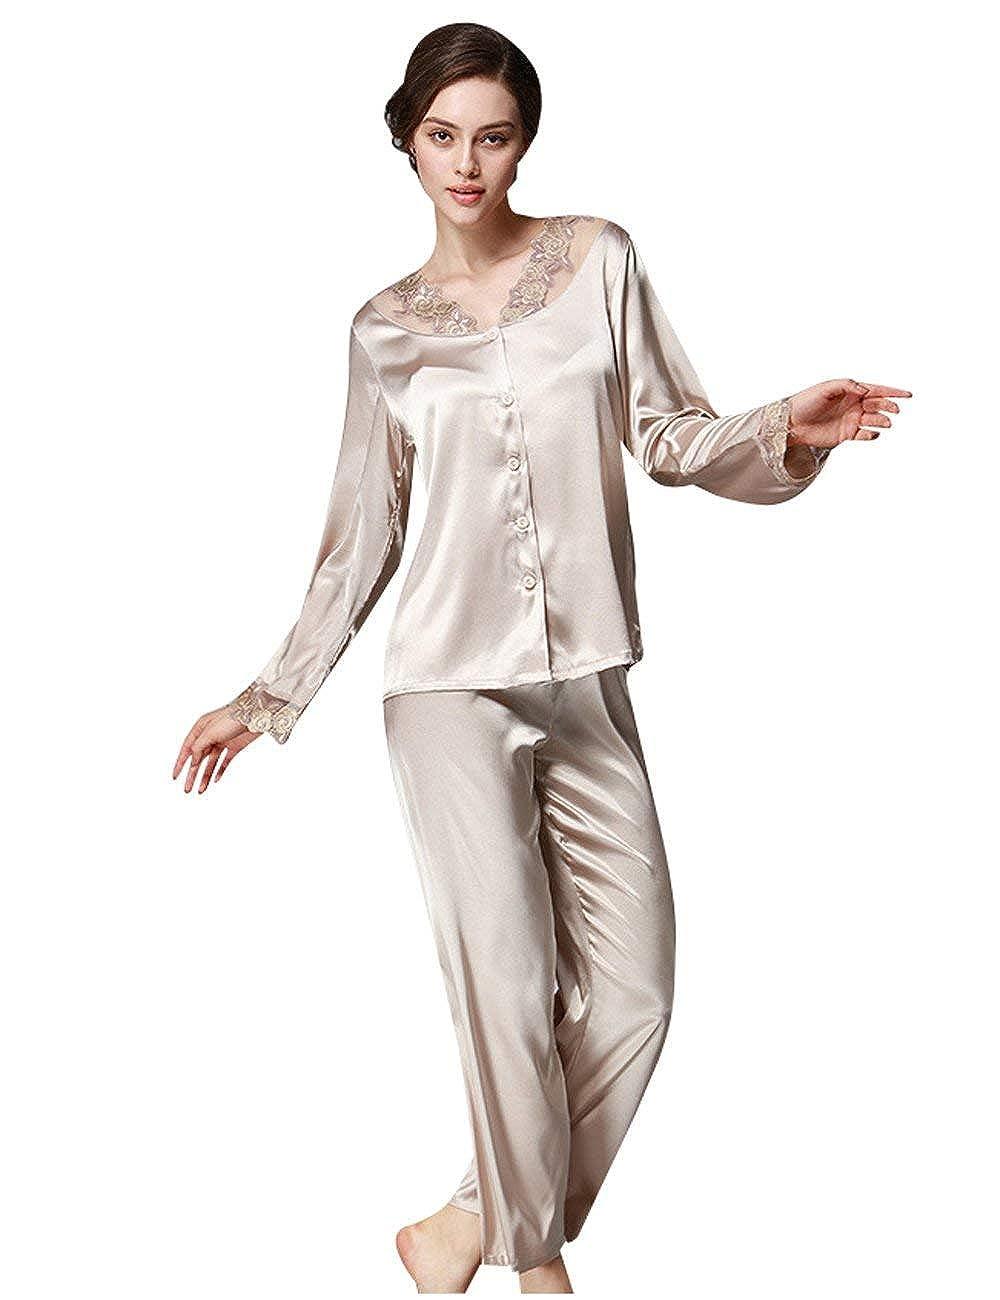 Donna Vestaglia Elegante Moda alla Moda Set Pigiama Tops Set Moda da  Pigiama Pantalone Primaverile Due b33c980d2ce